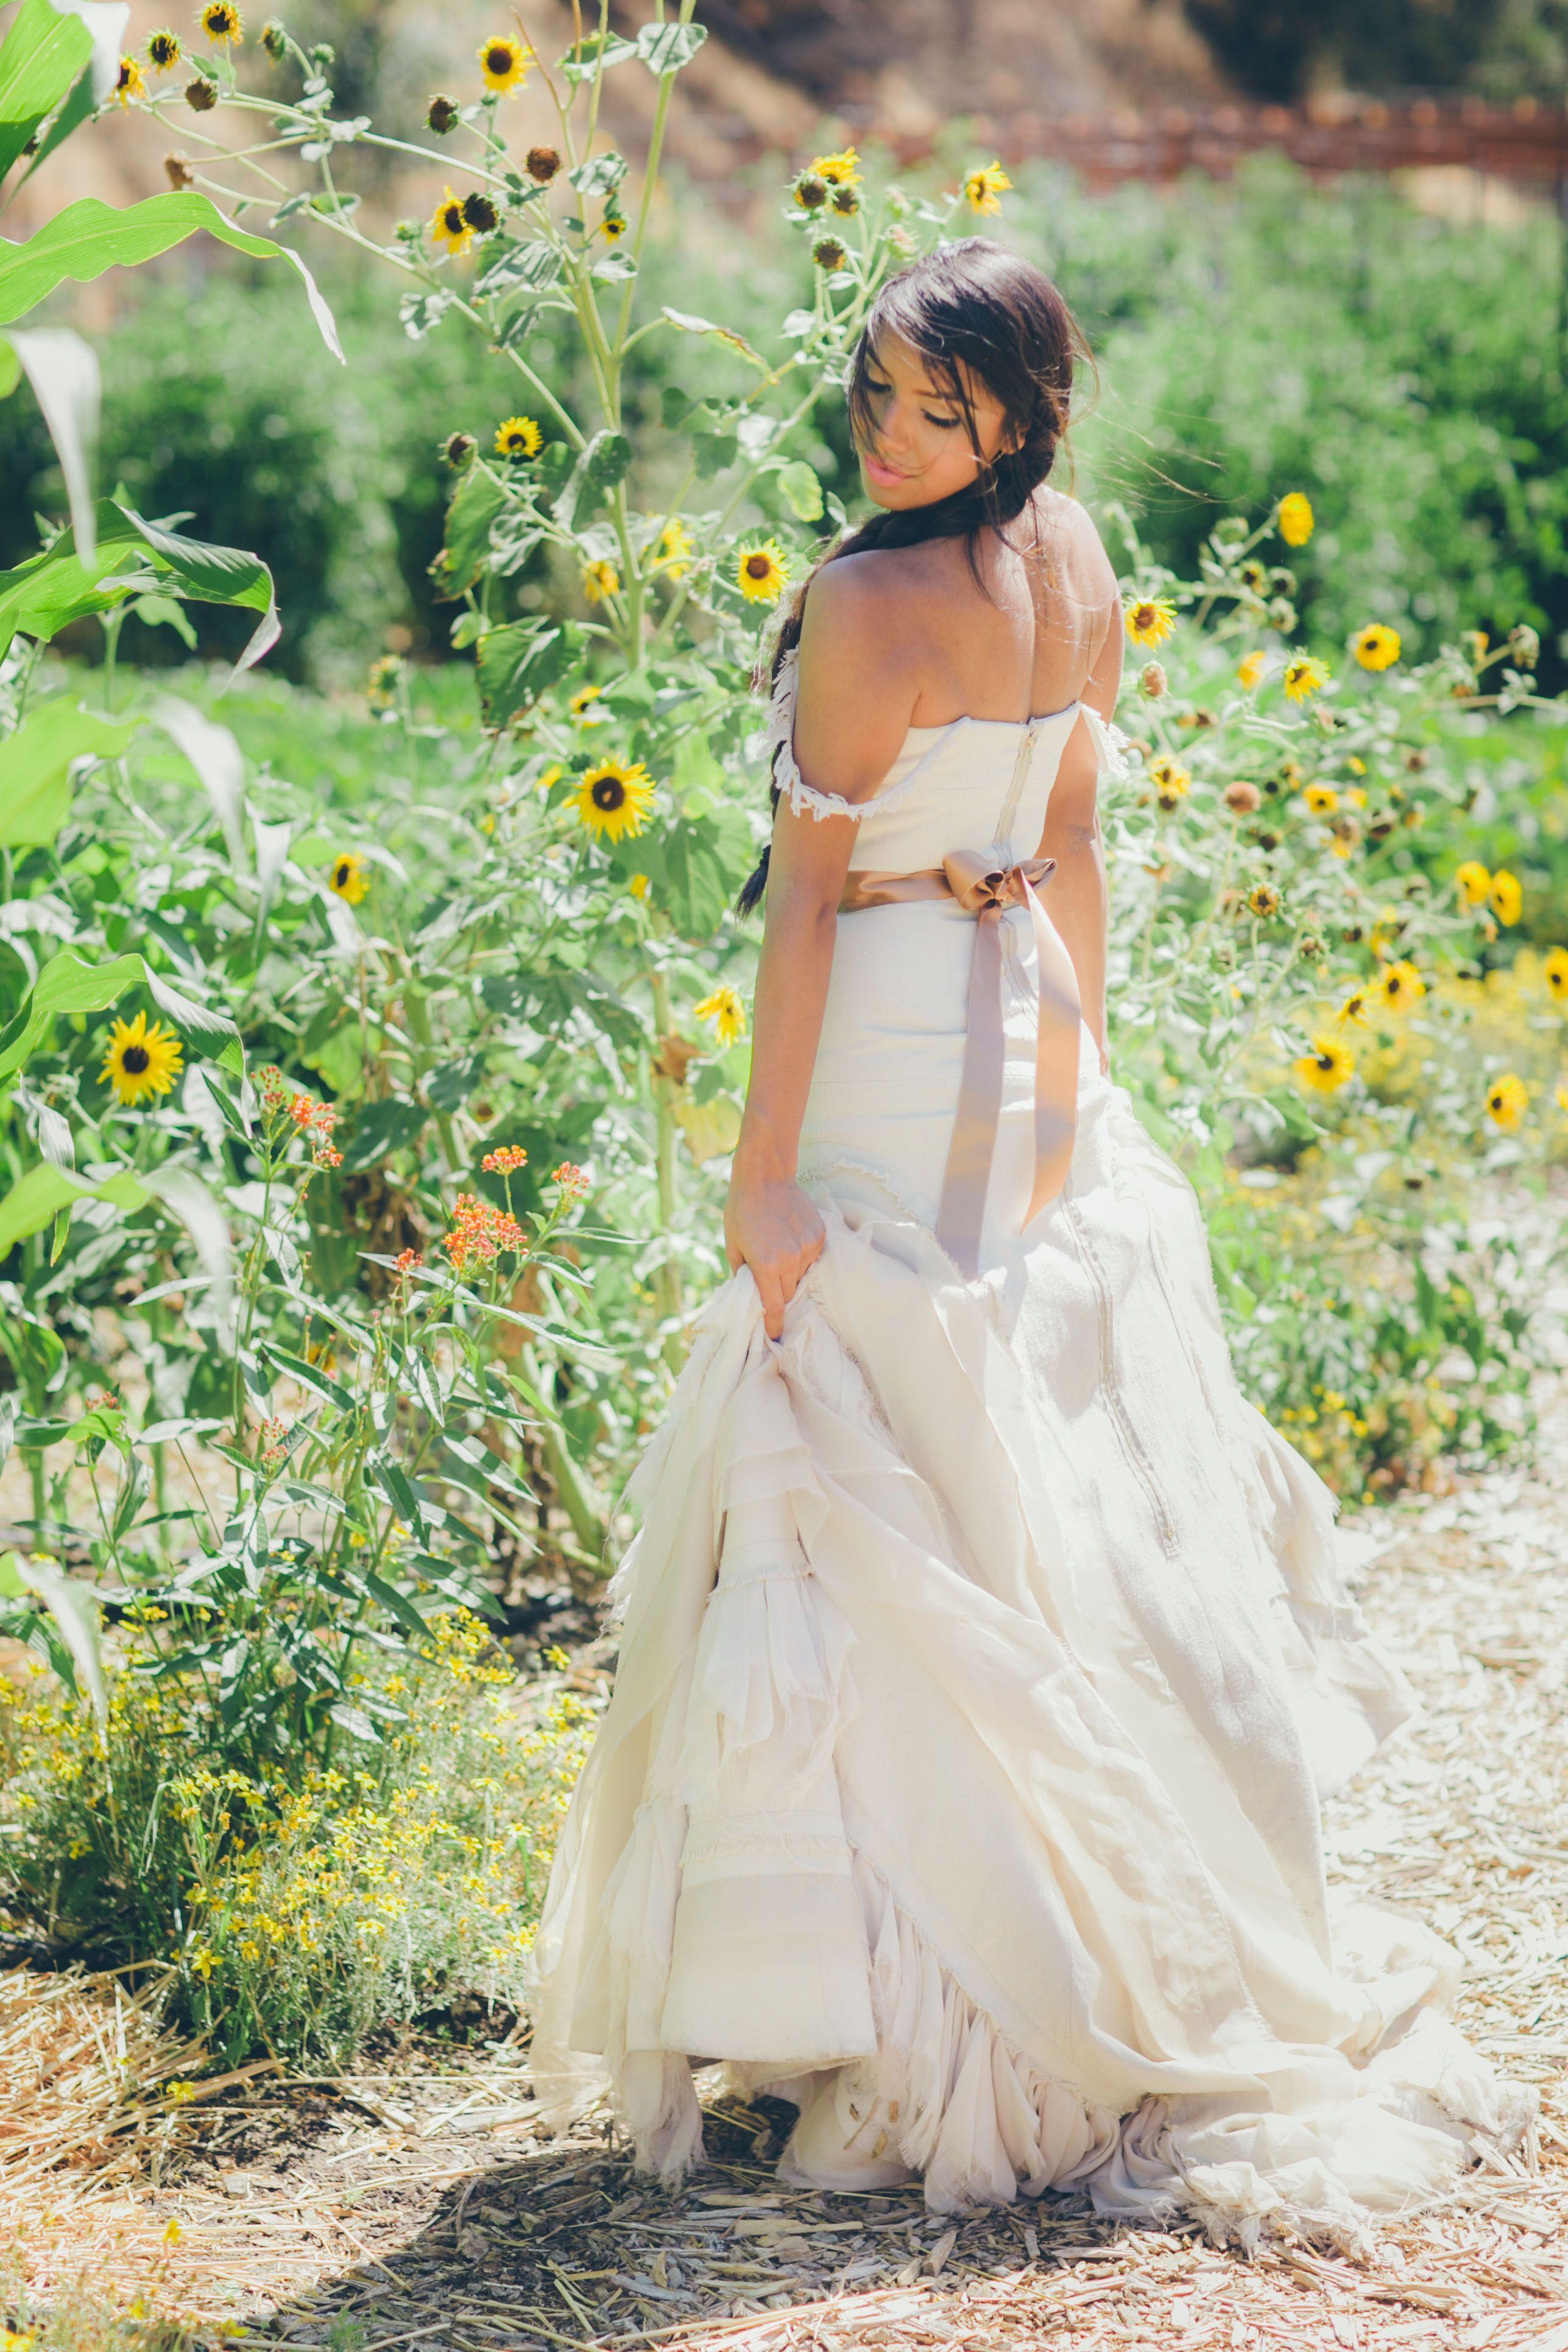 Native american wedding dress  Native American Wedding Creative Flow Co  Desire in the Desert